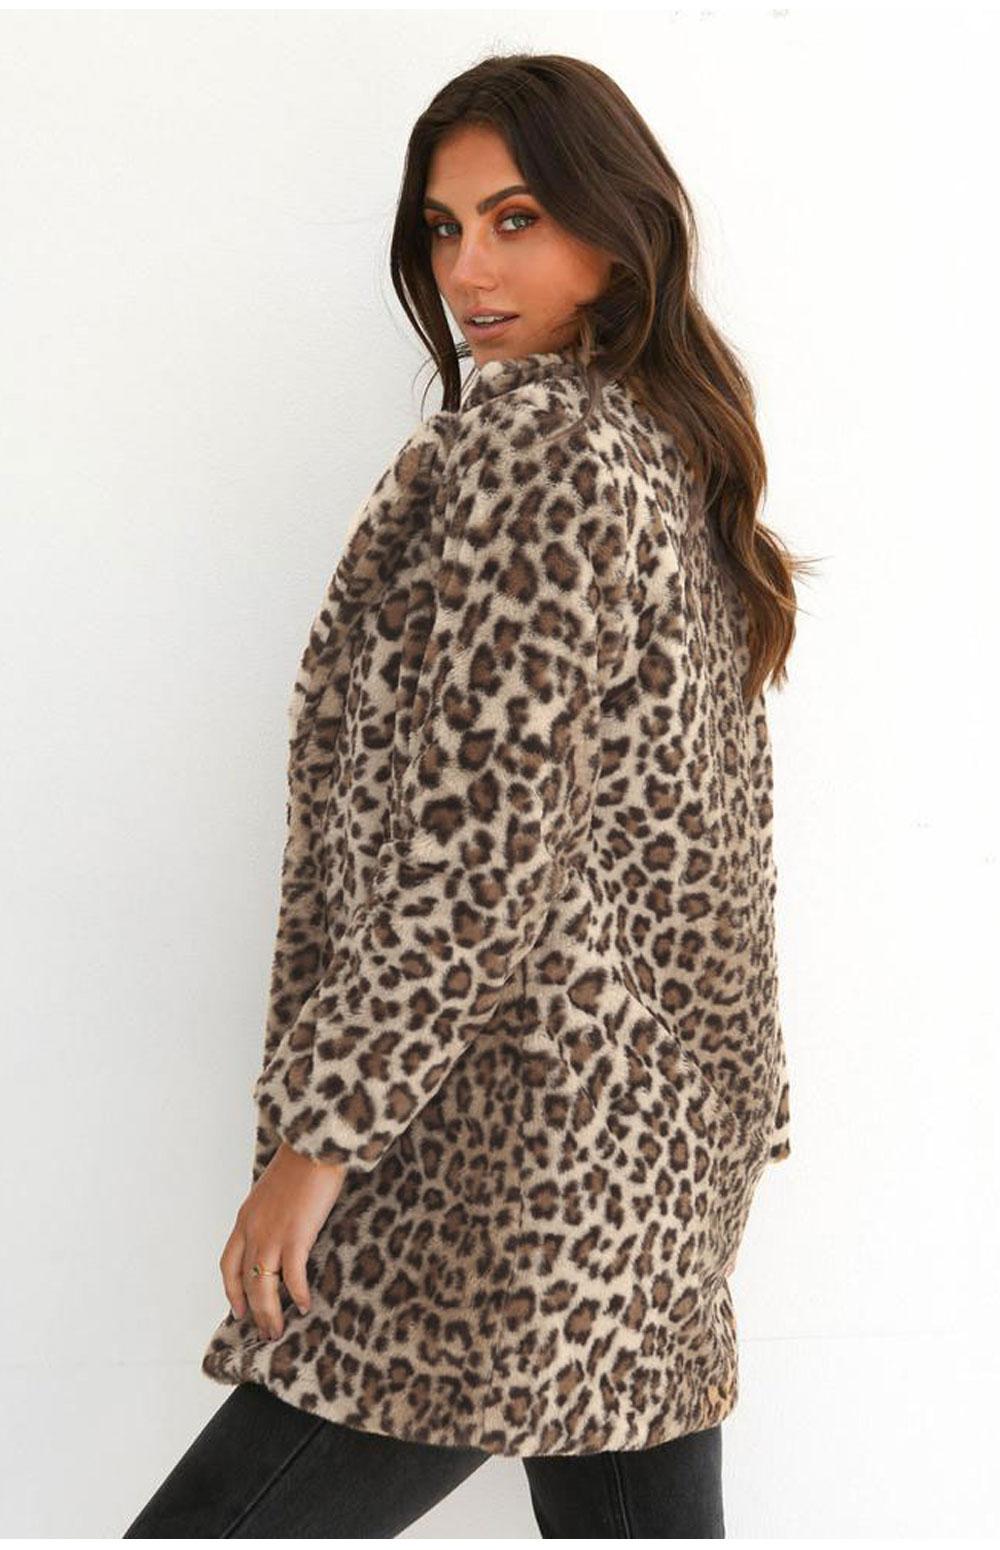 HTB1u3PkXEjrK1RkHFNRq6ySvpXas Hirigin 2018 Newest Hot Womens Winter Leopard Fluffy Fleece Jacket Coat Cardigans Hooded Jumper Tops Clubwear